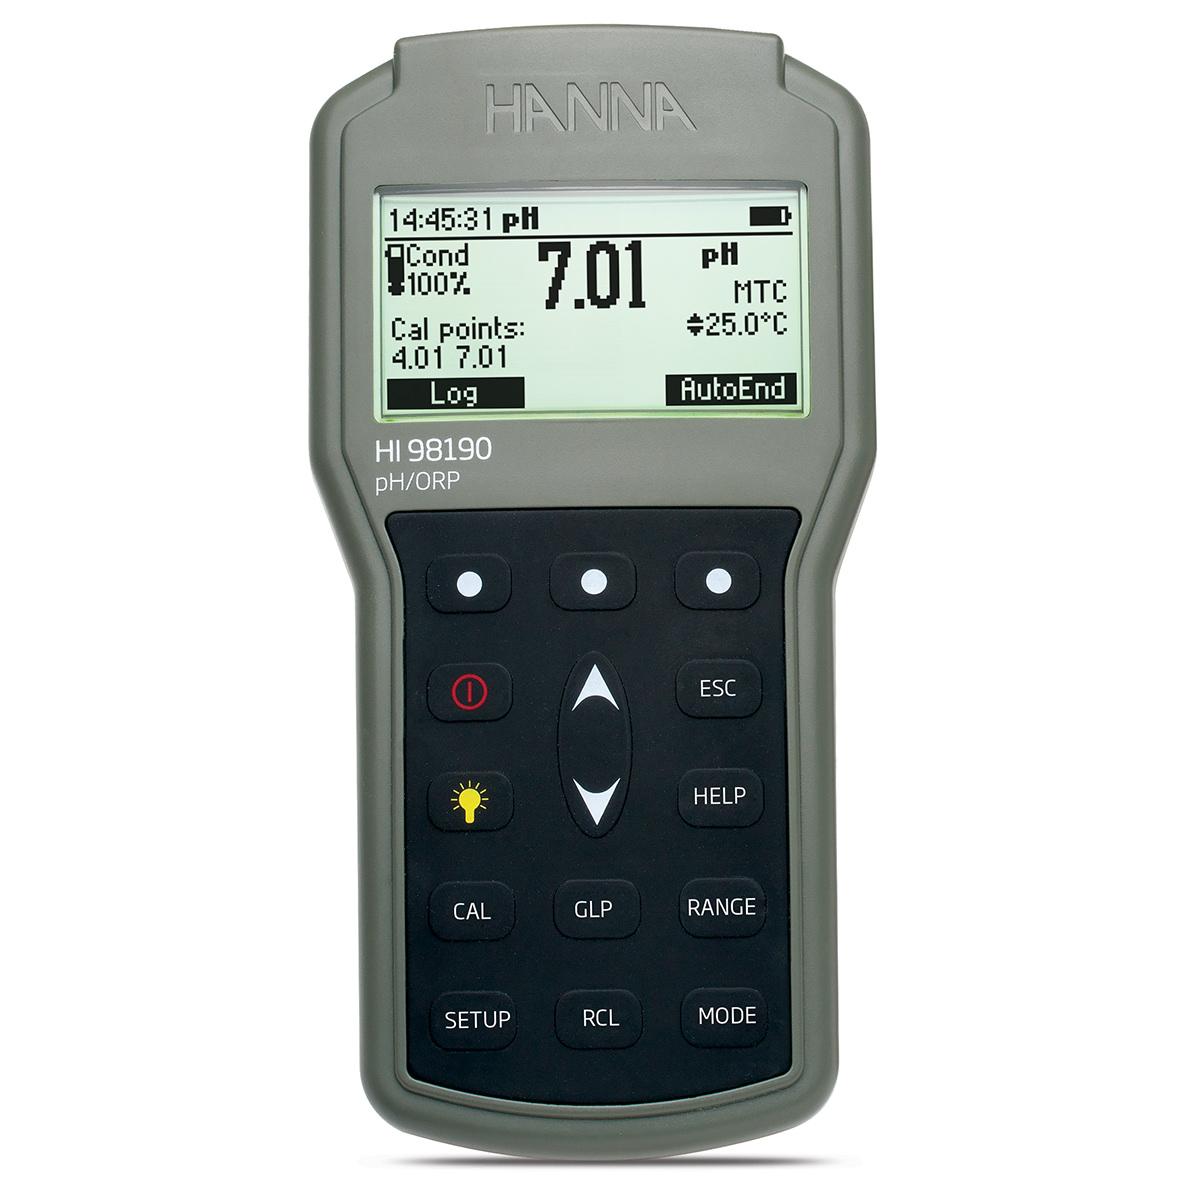 HI98190 - Misuratore portatile di pH/ORP/Temperatura a tenuta stagna